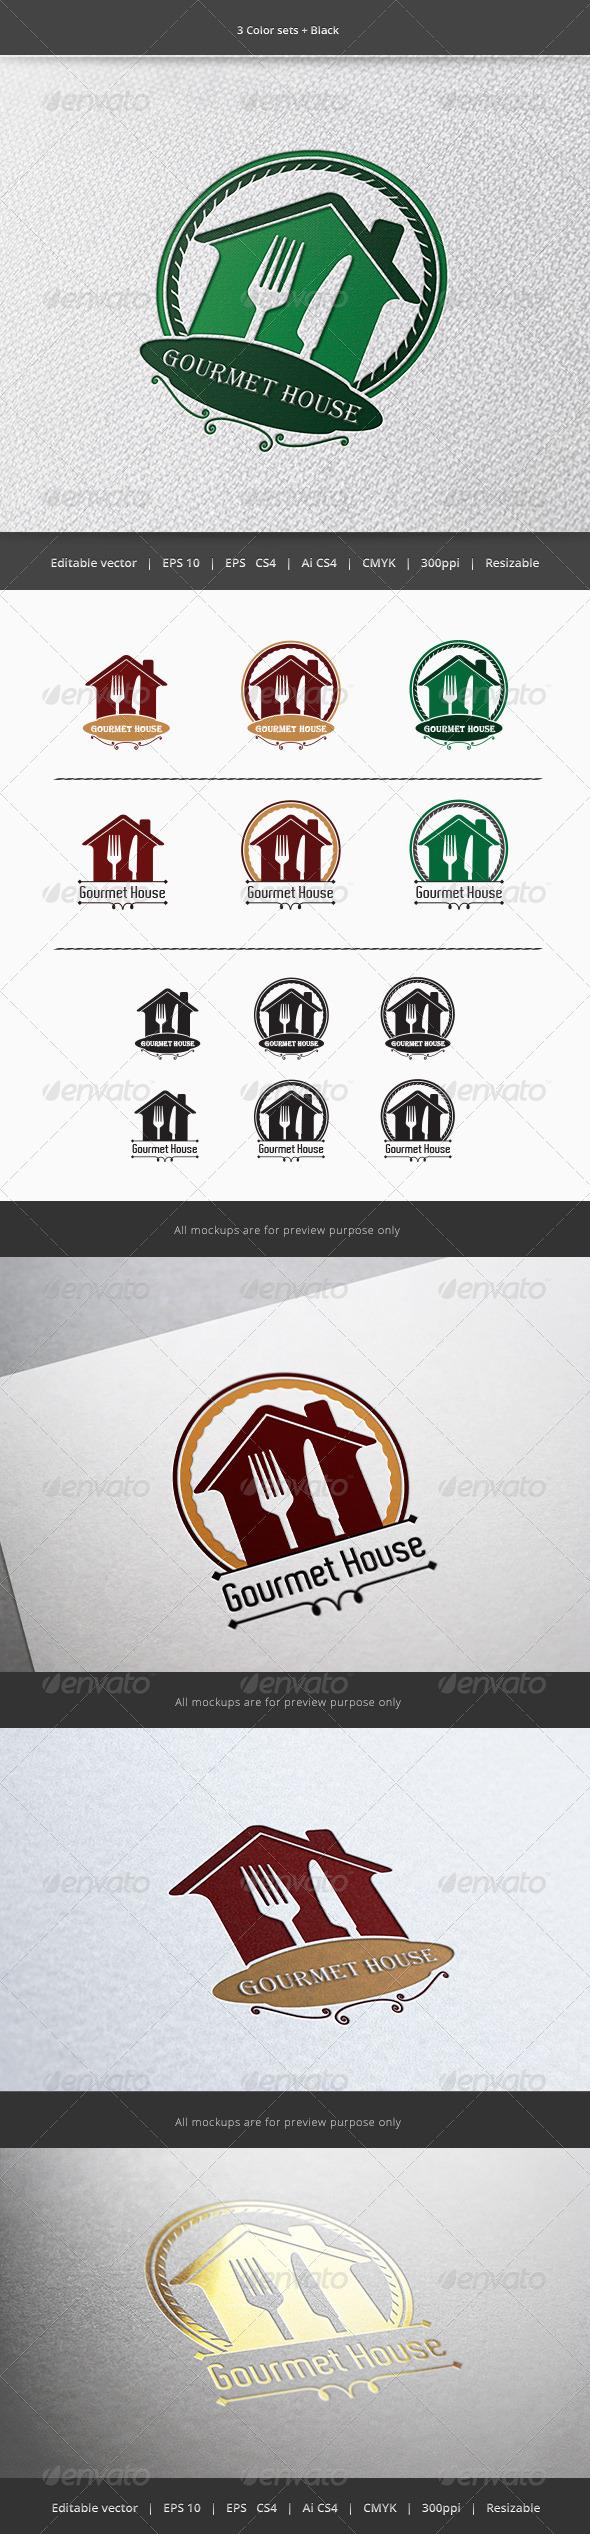 Gourmet House Restaurant Logo - Restaurant Logo Templates